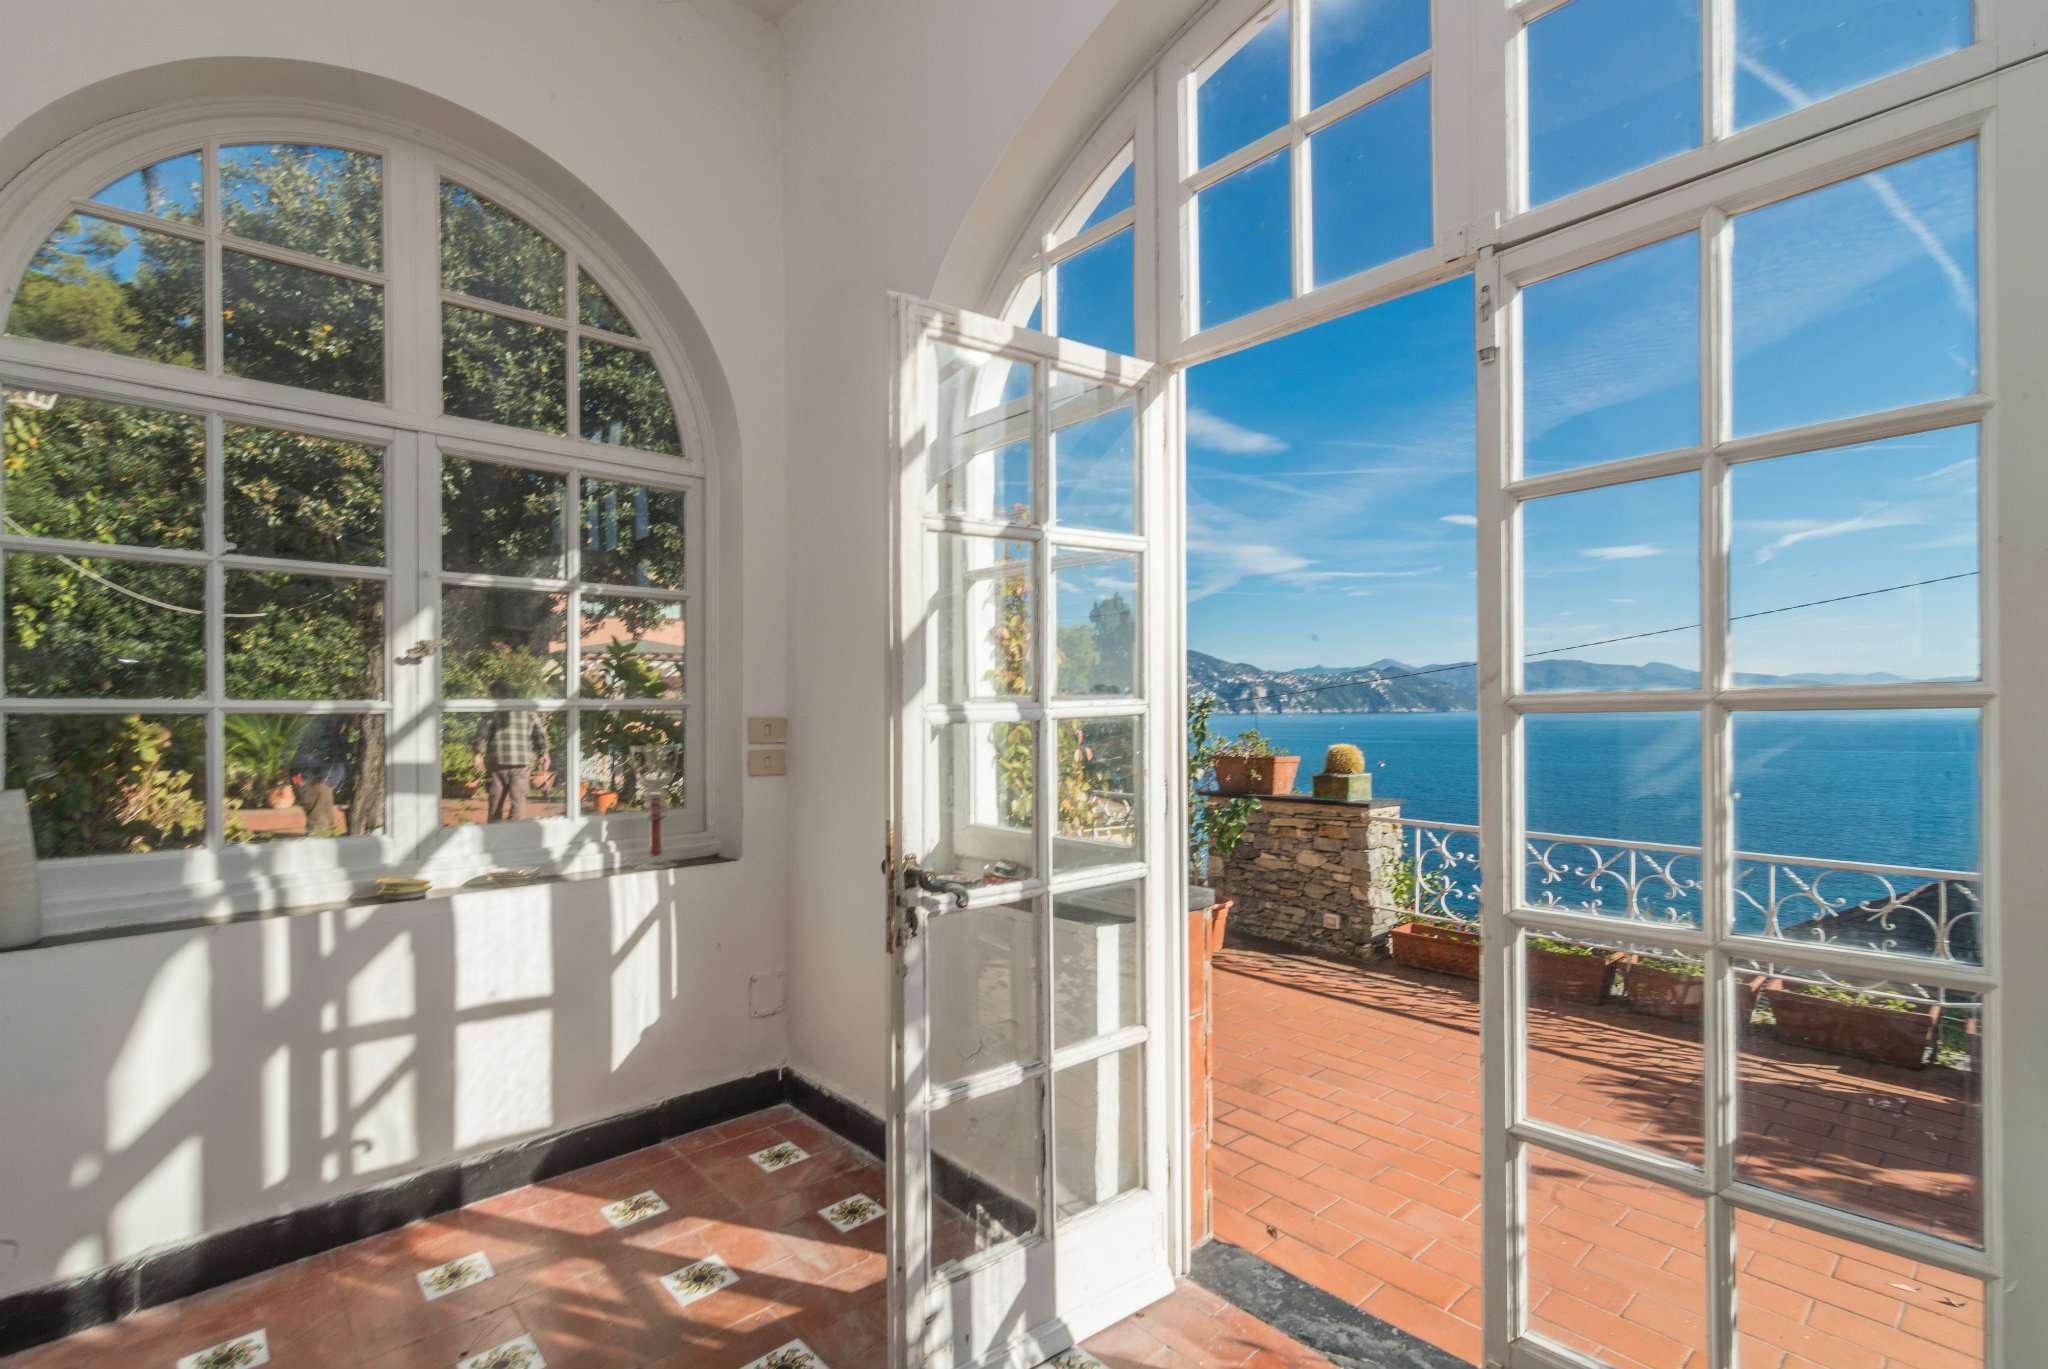 Villa in Vendita a Santa Margherita Ligure: 5 locali, 545 mq - Foto 13